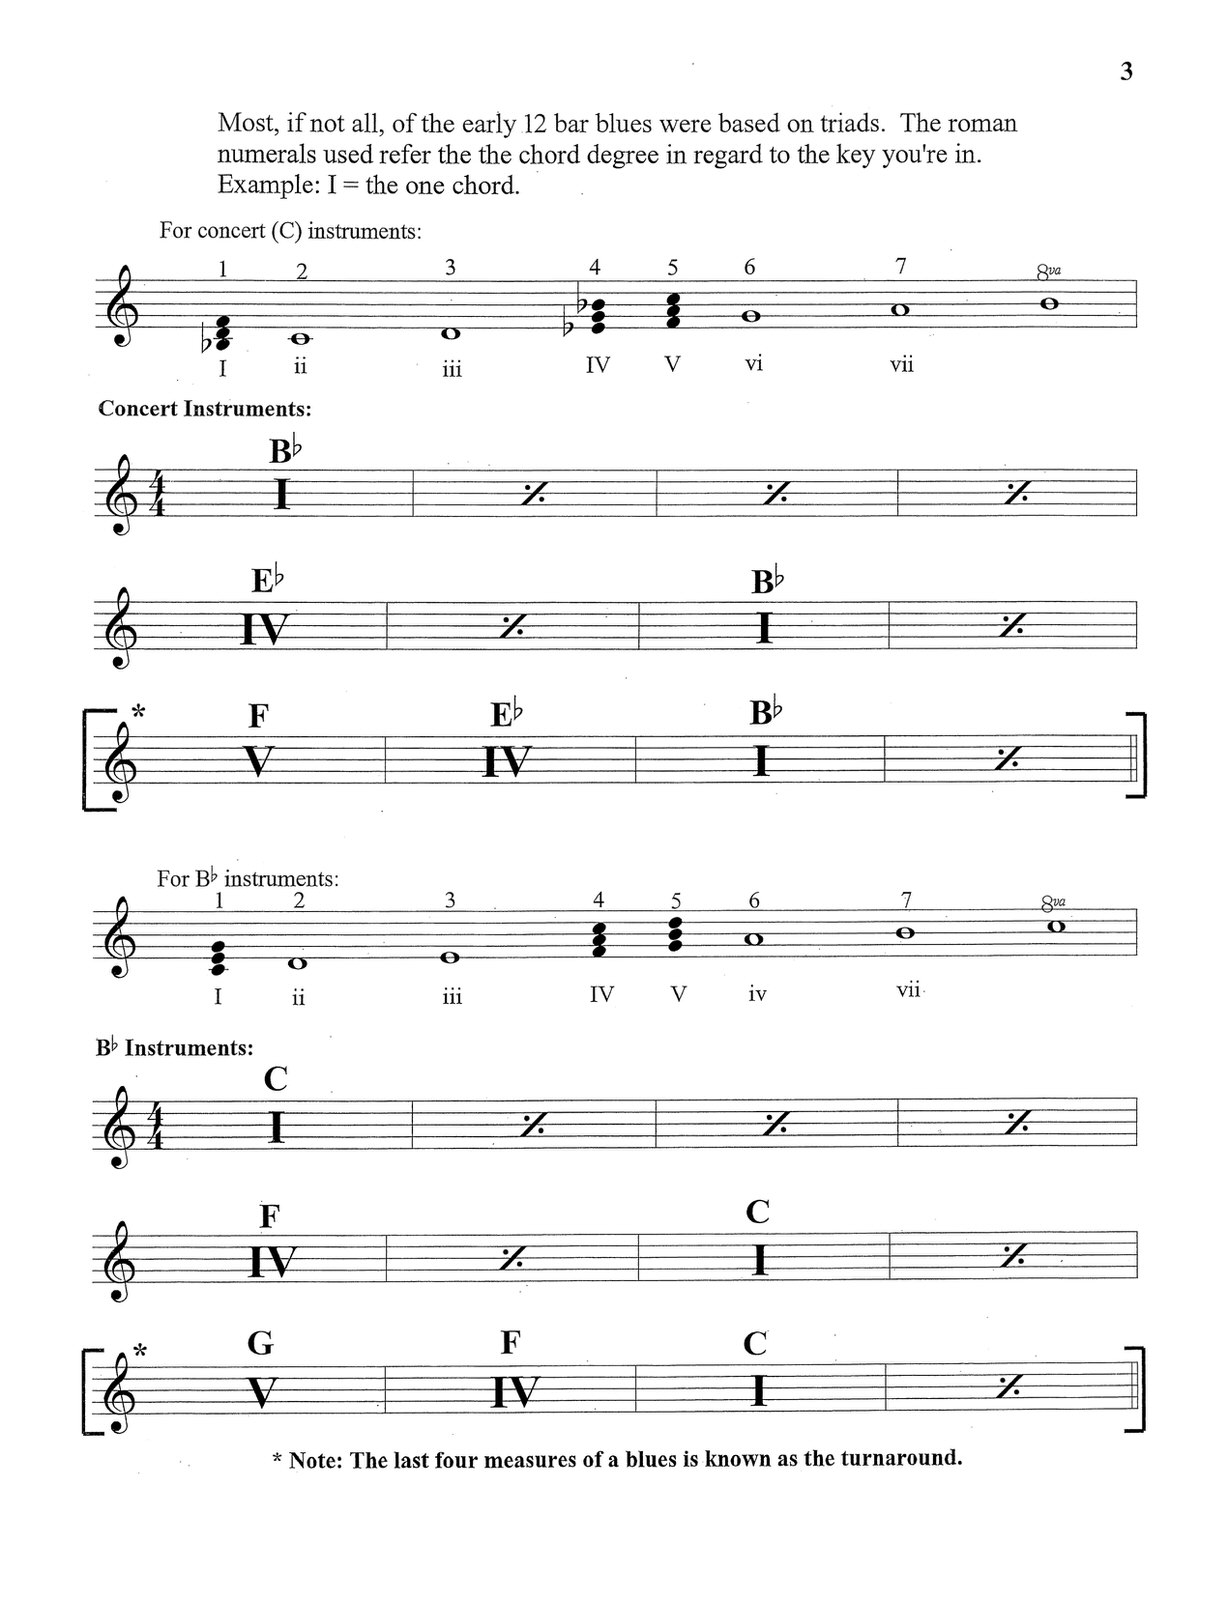 allen-intro-to-bb-concert-blues-3